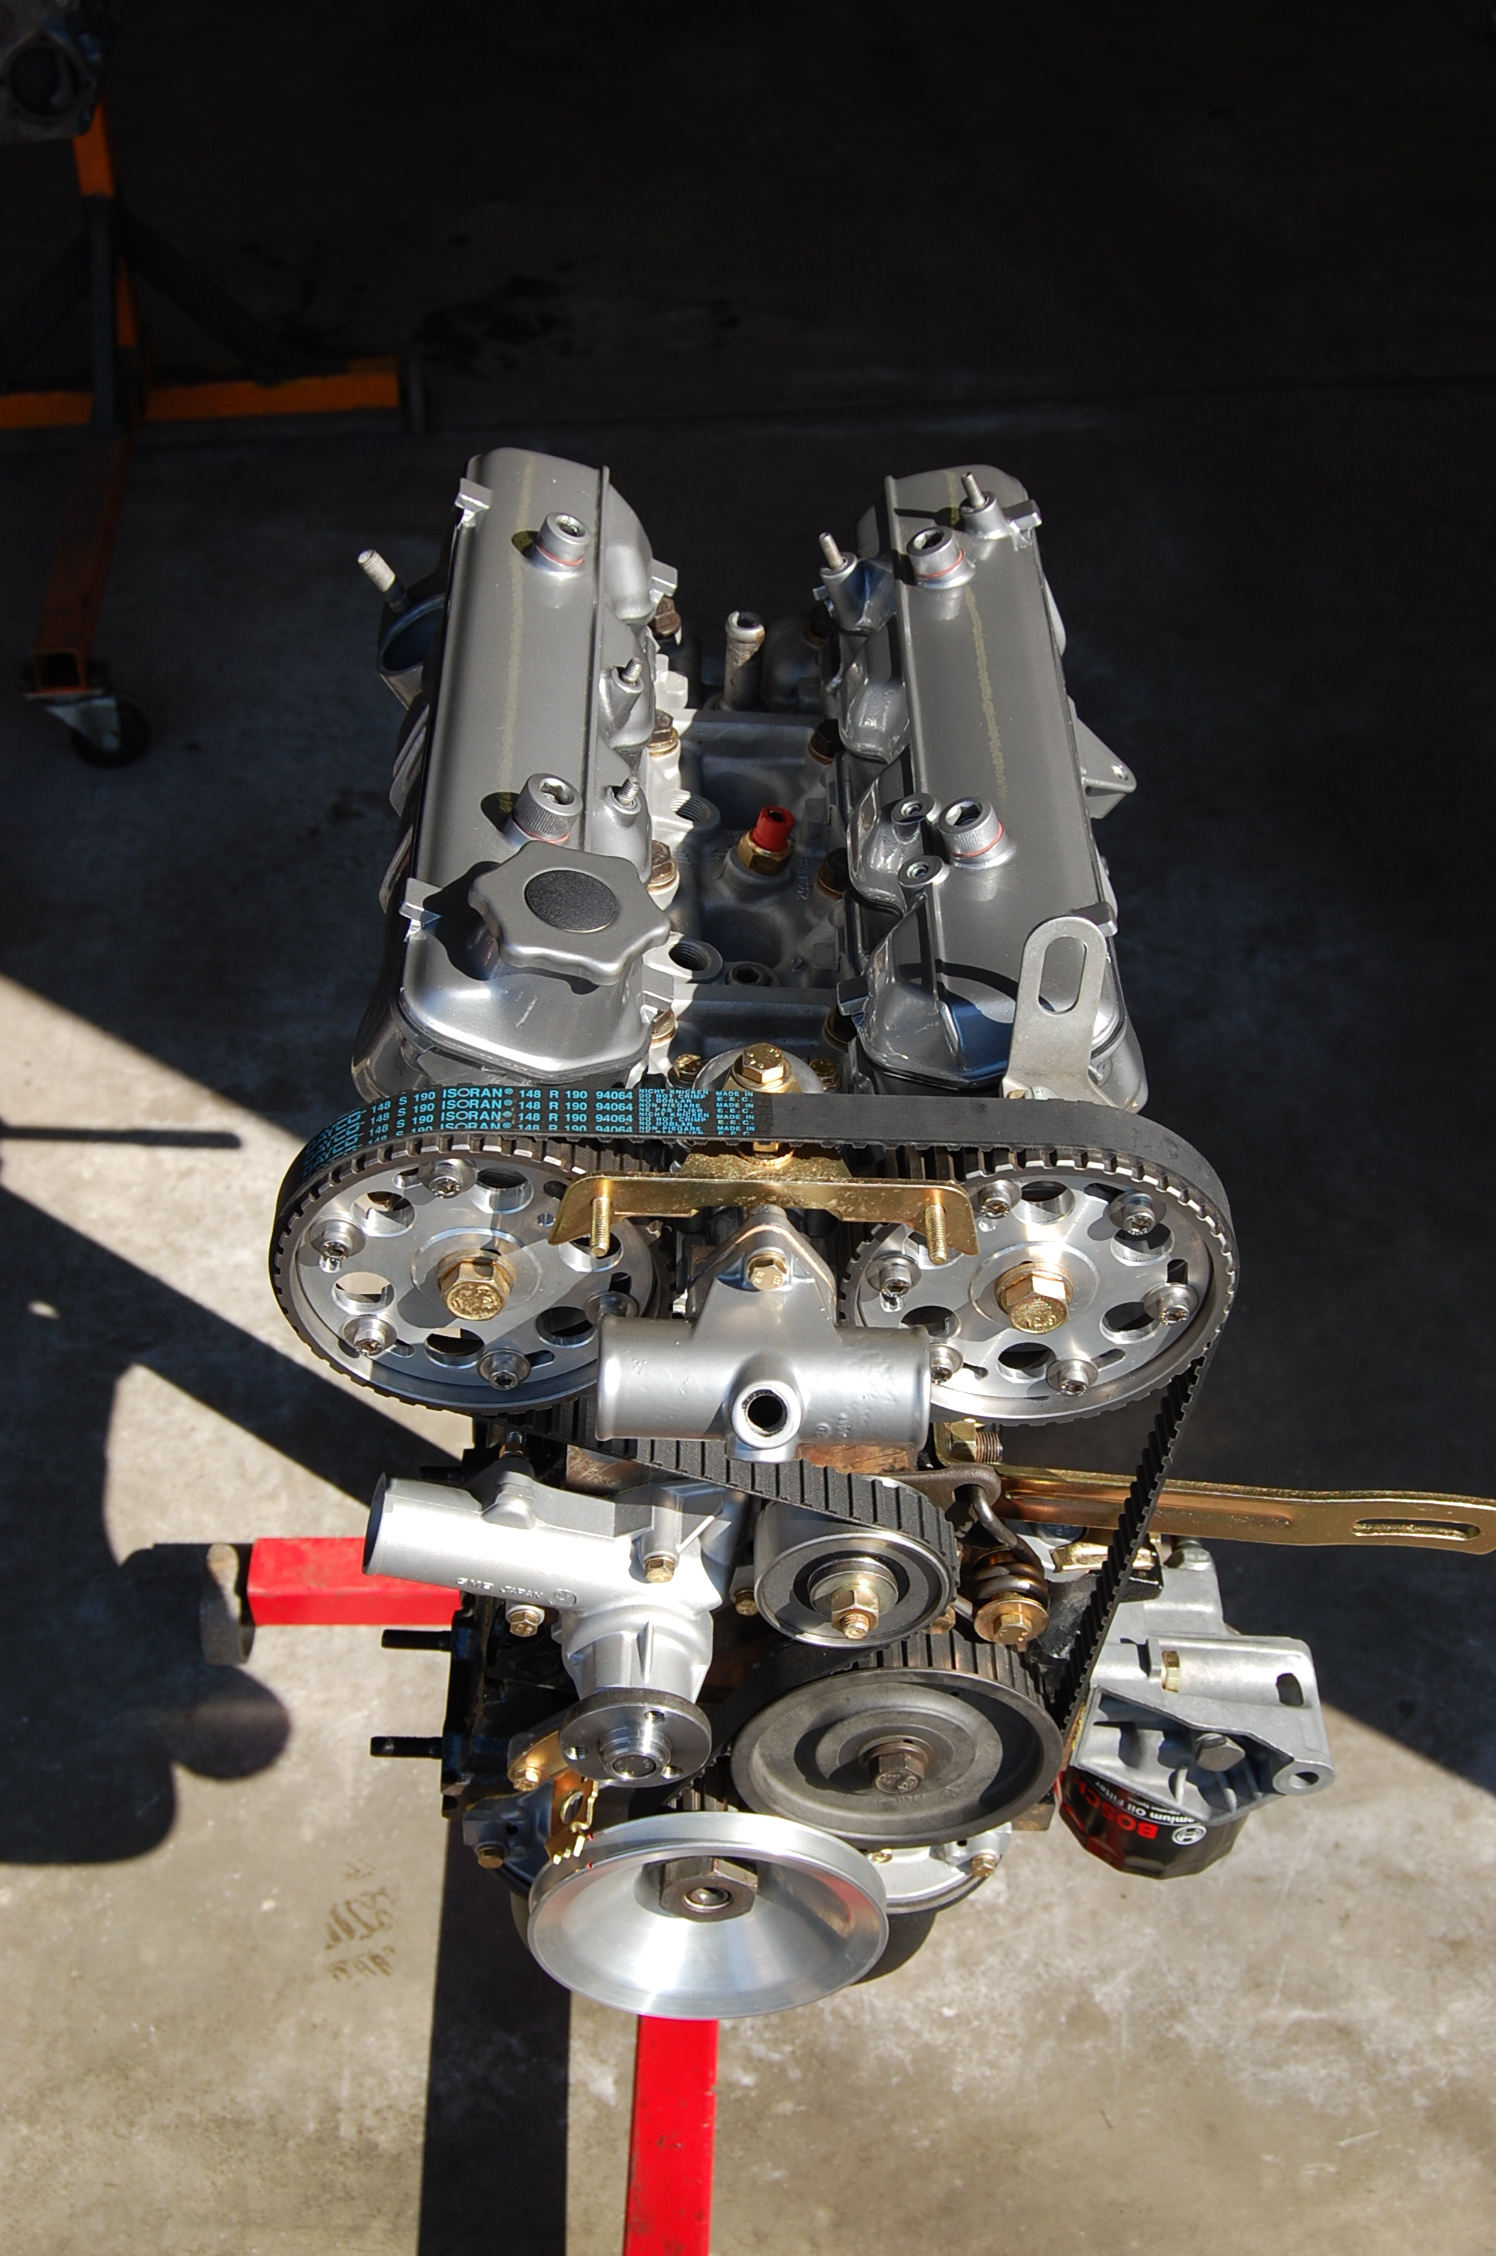 Fiat Lancia Pininfarina Parts Engine Building Services 124 Transmission Diagram